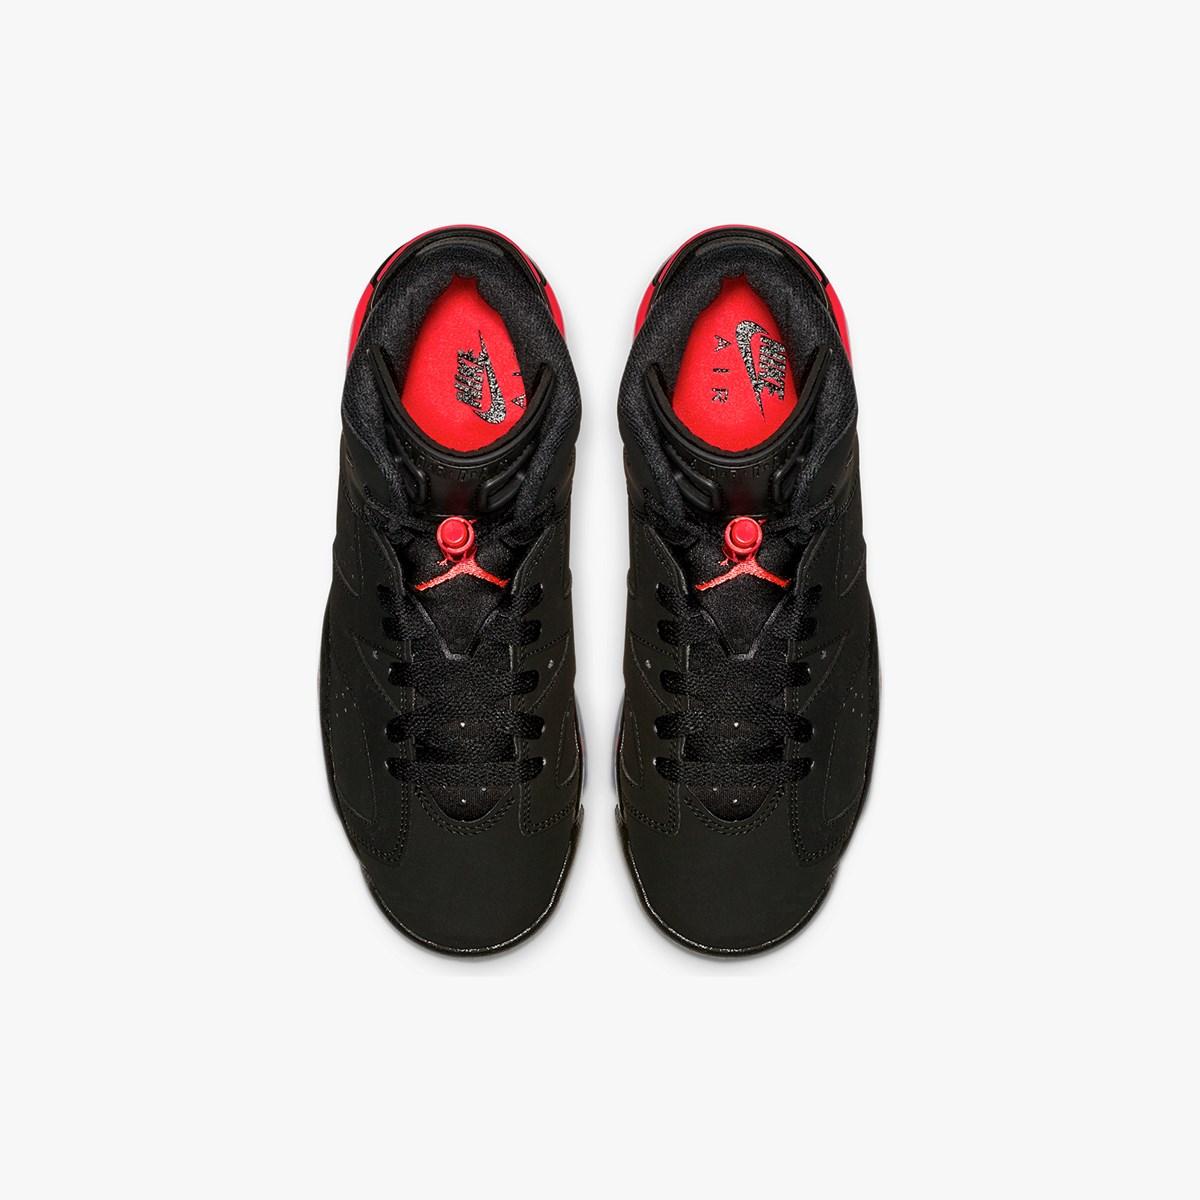 783c15b6b33de Jordan Brand Air Jordan 6 Retro (GS) - 384665-060 - Sneakersnstuff |  sneakers & streetwear online since 1999